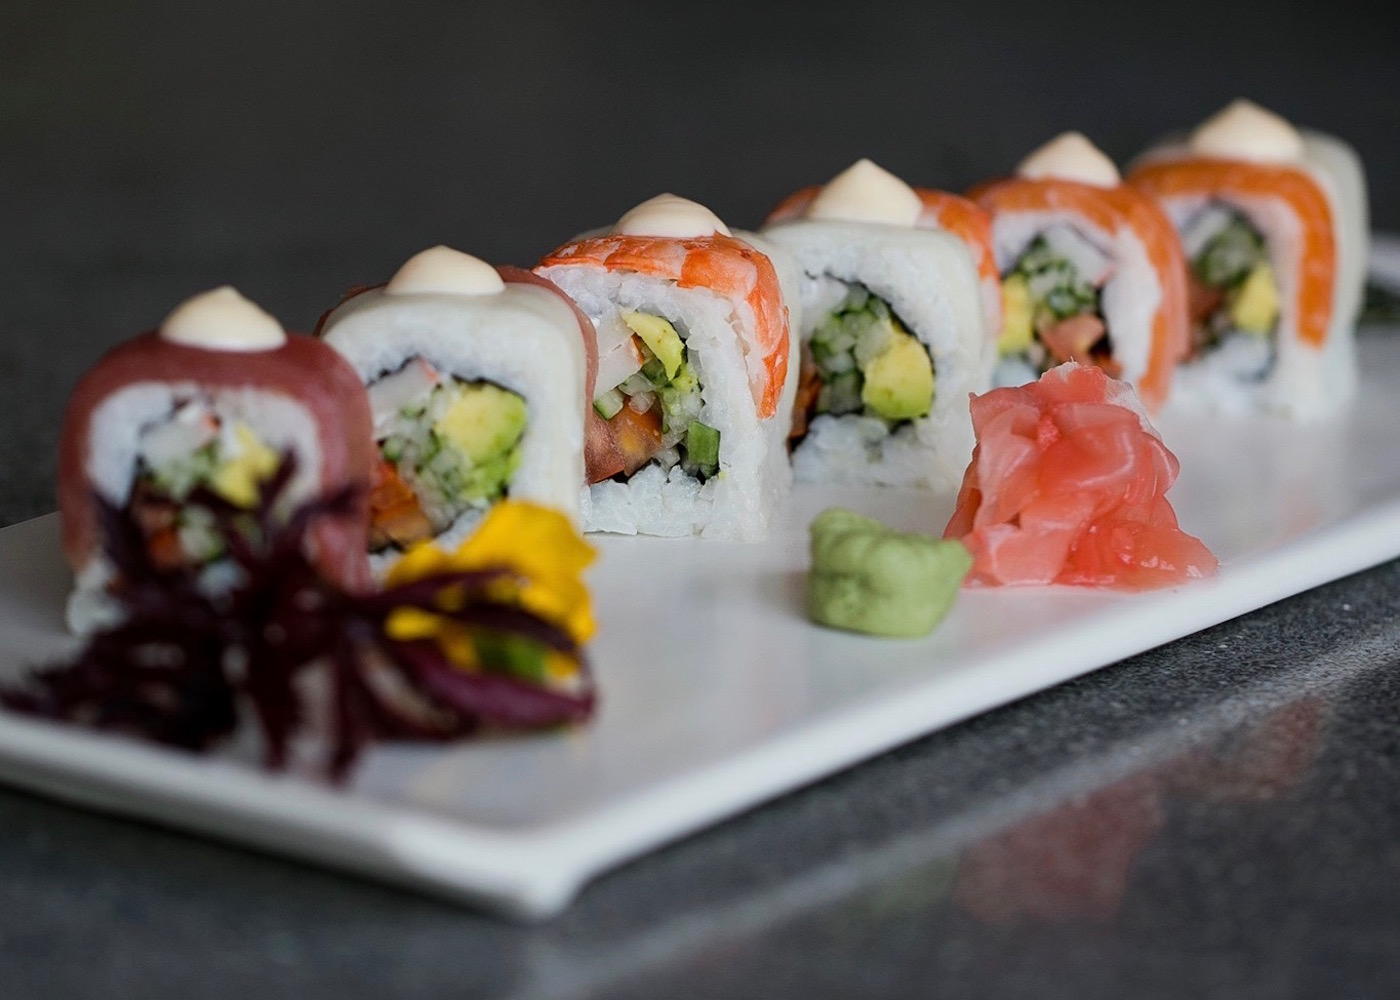 Enso - best new sushi restaurant in Canggu, Bali, Indonesia